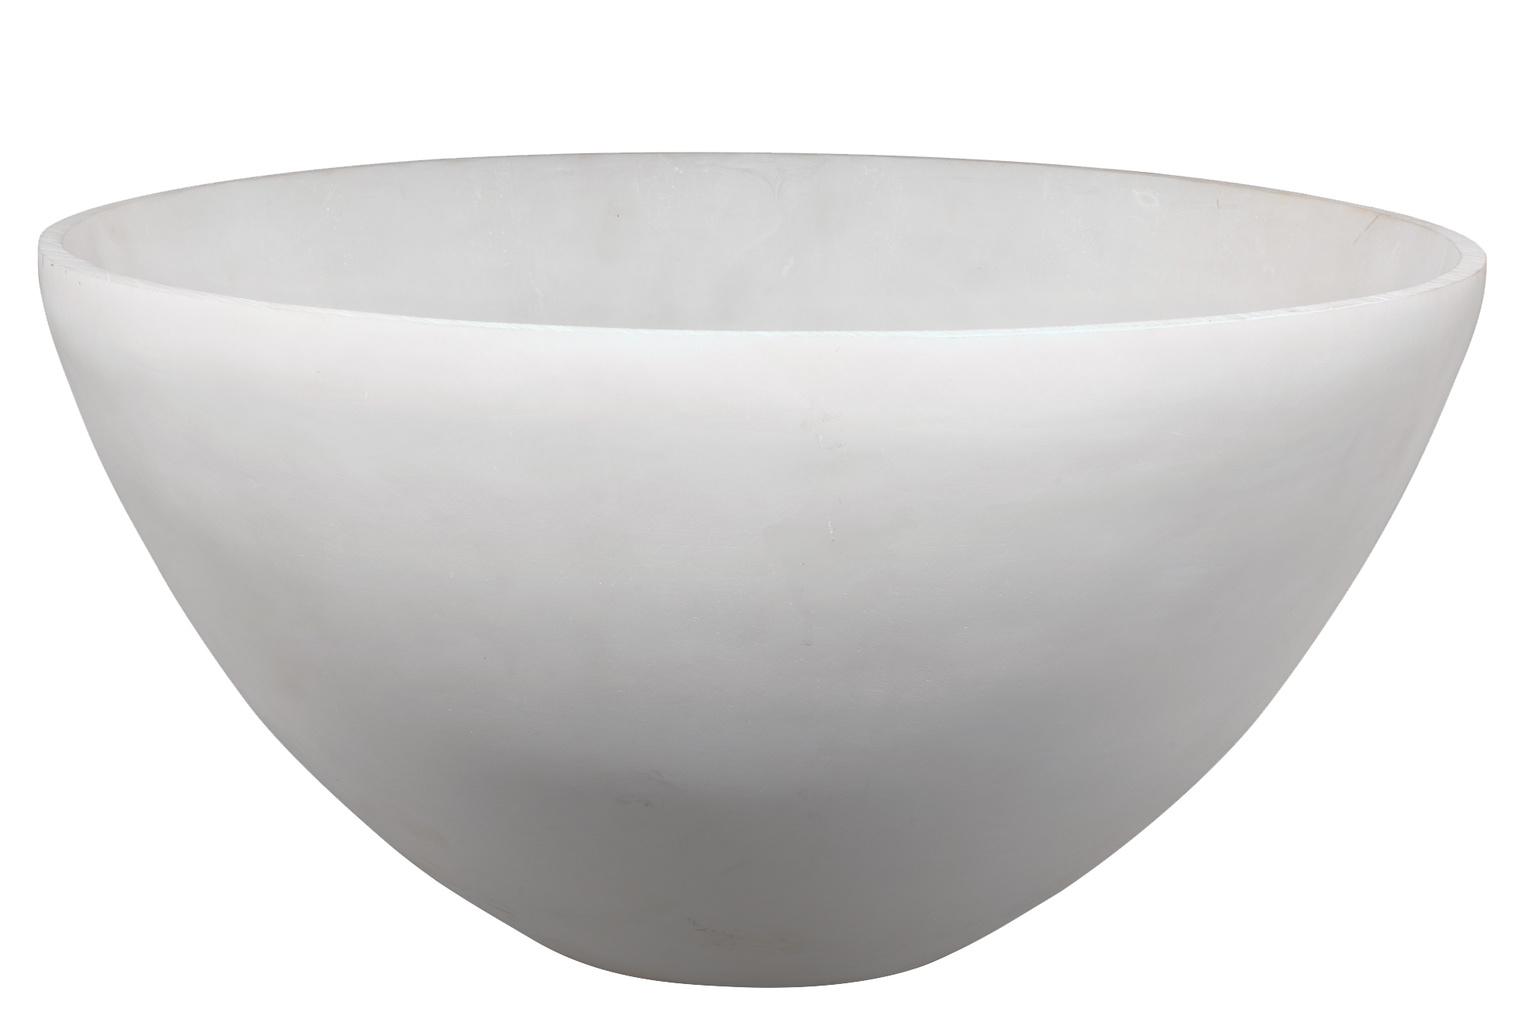 7geor lgal largegeorginabowl white%20copy